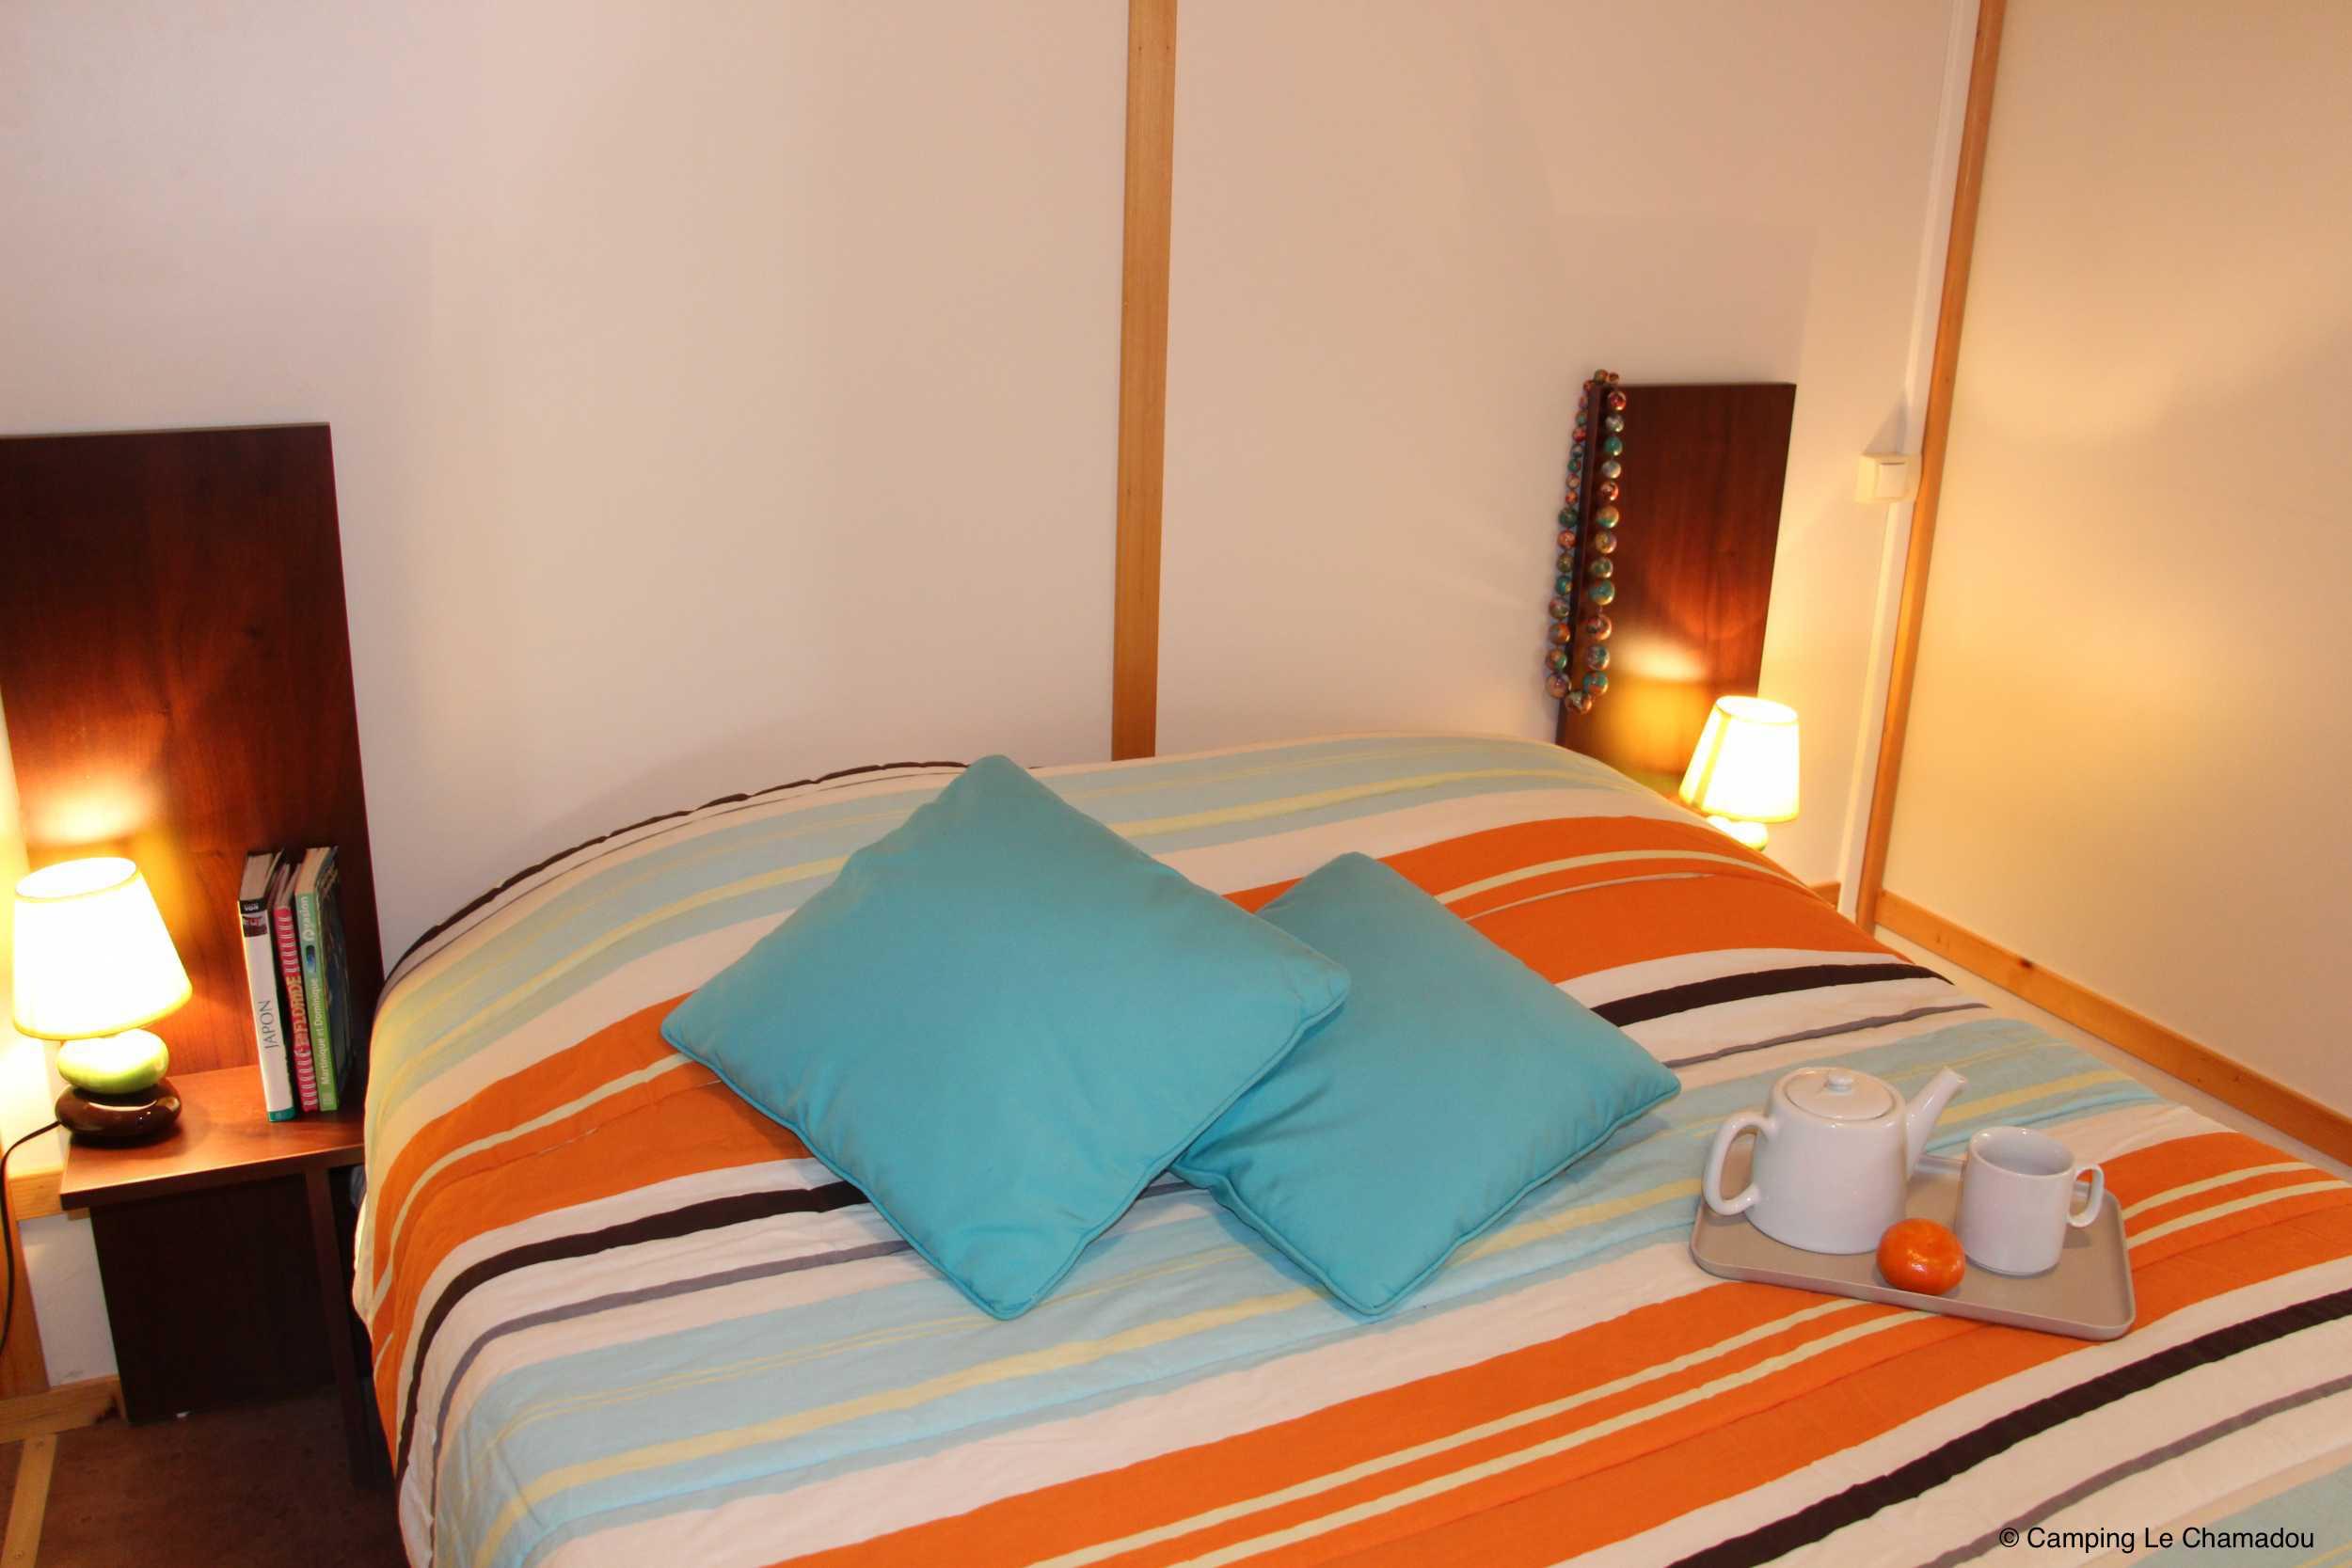 CampingLeChamadou-sudardeche-4etoiles-locations-prestige5.jpg